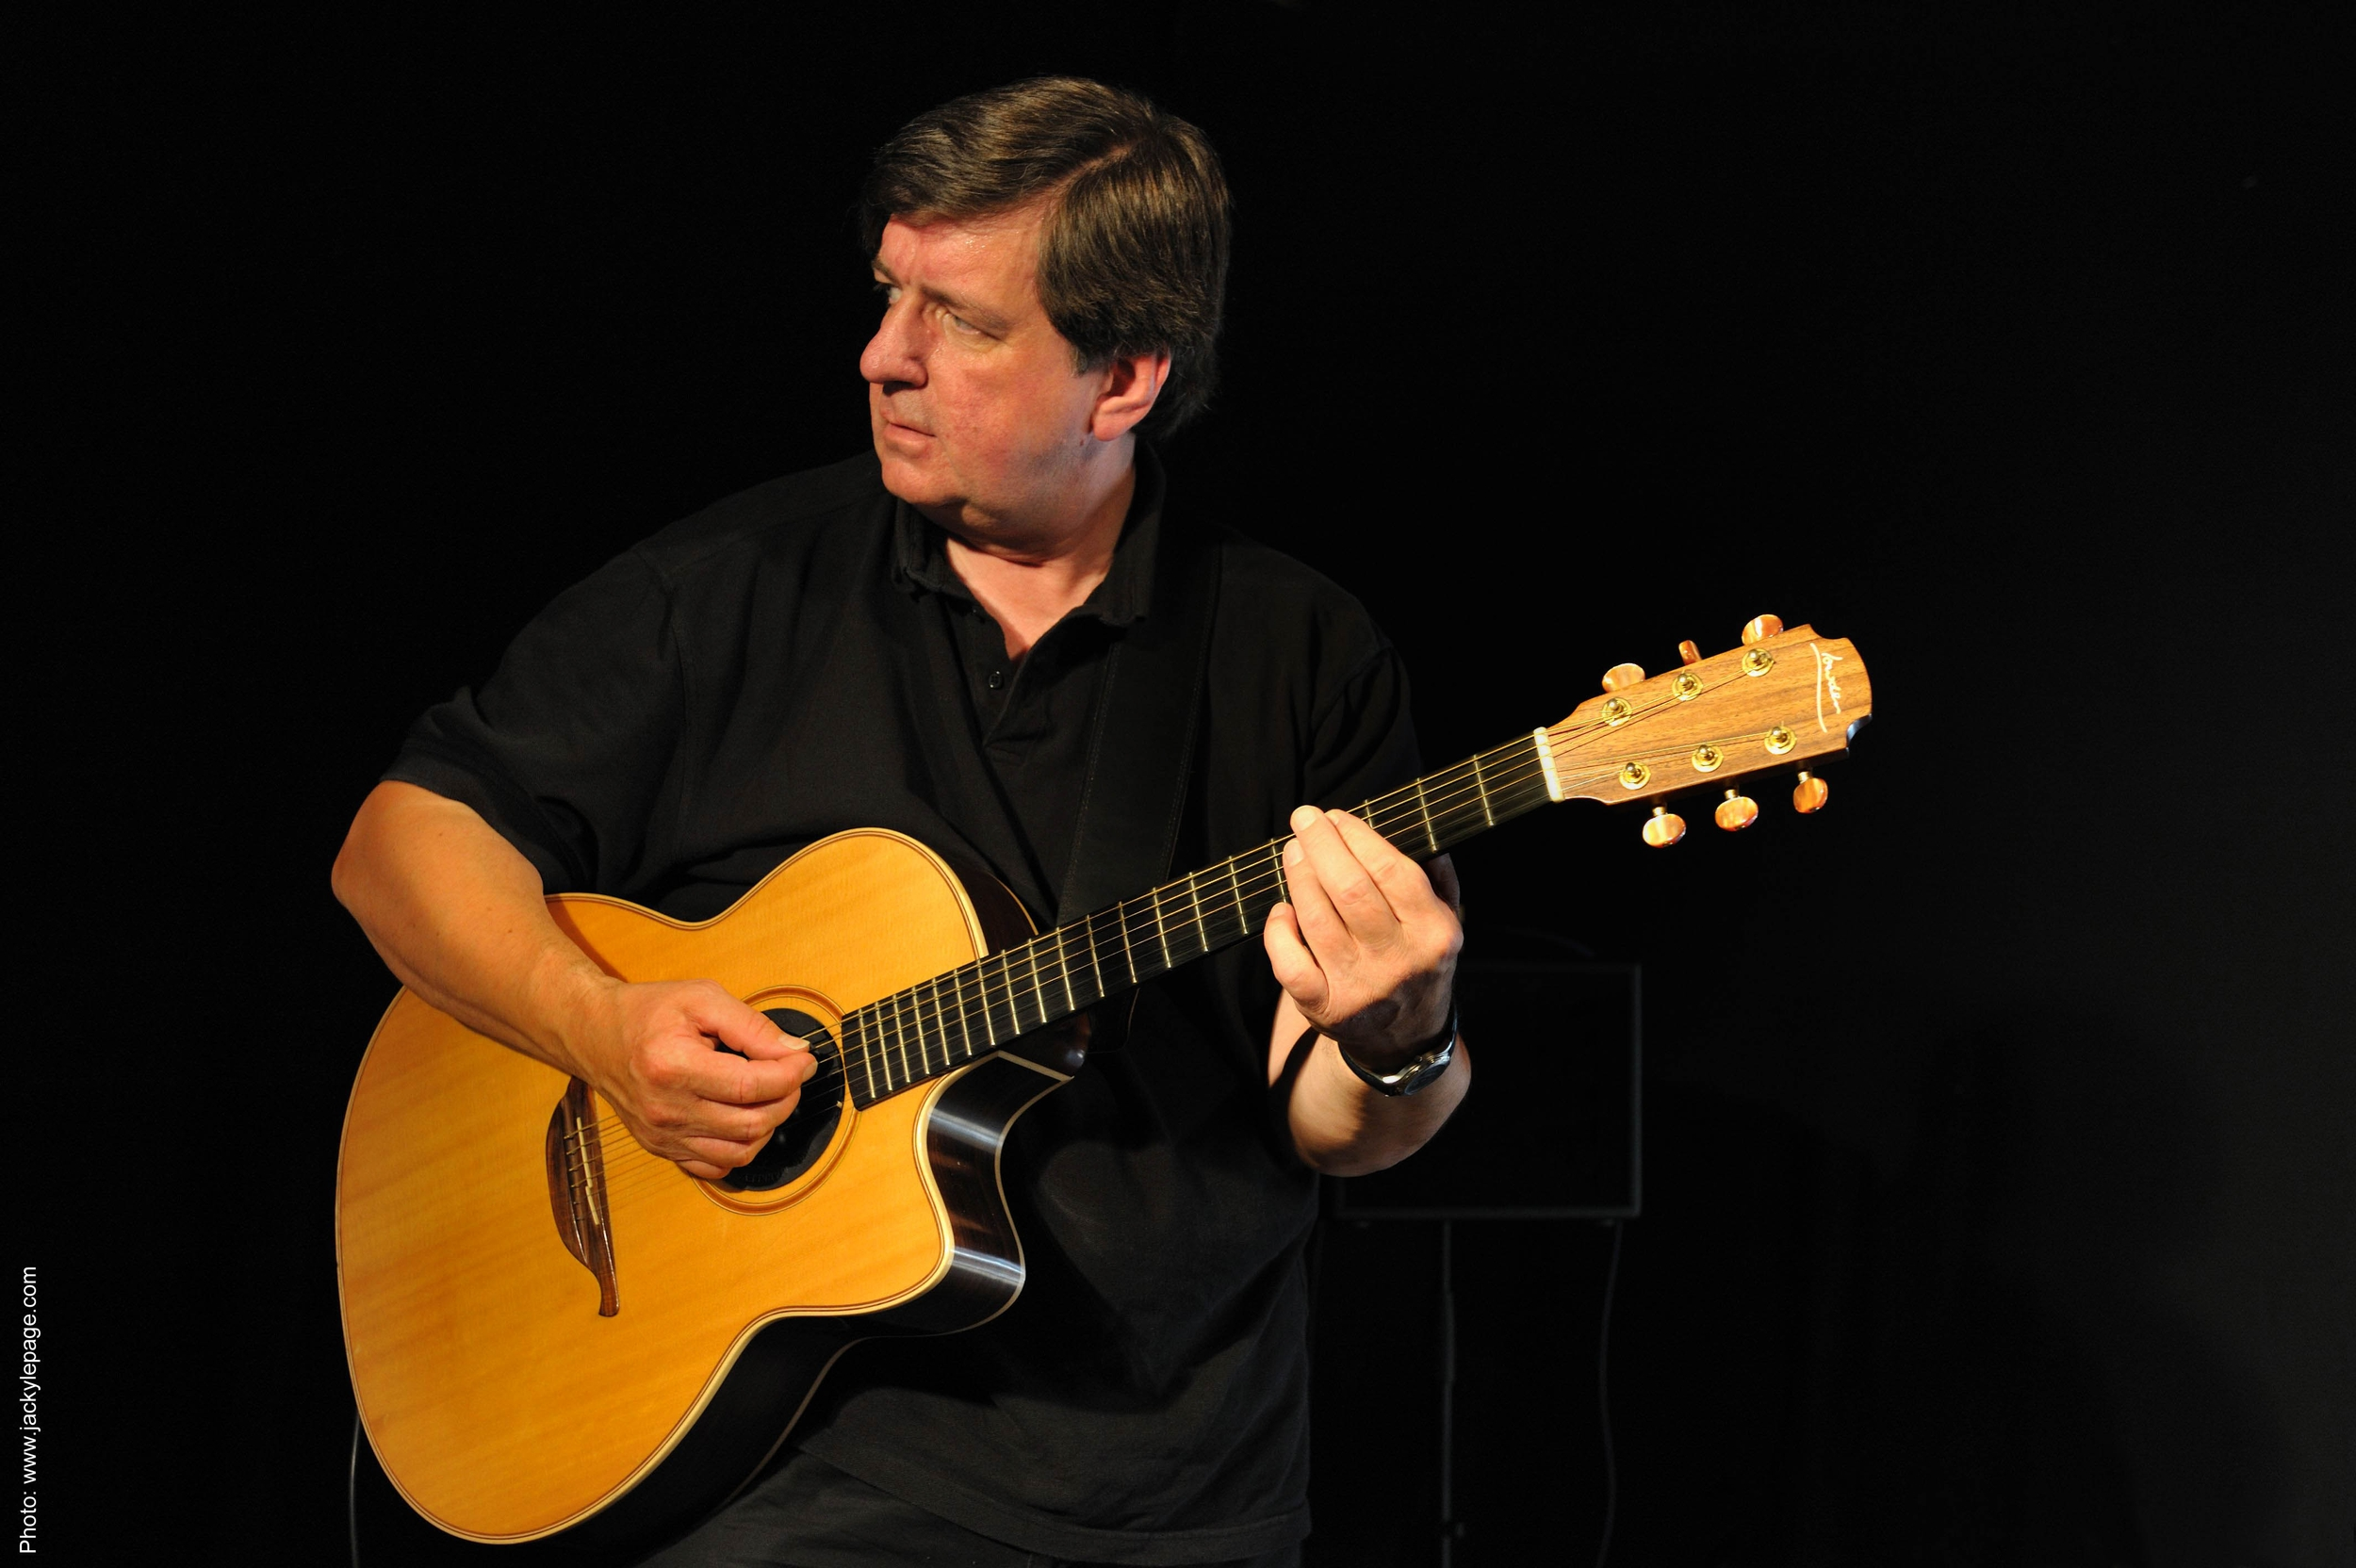 Jacques Pirotton